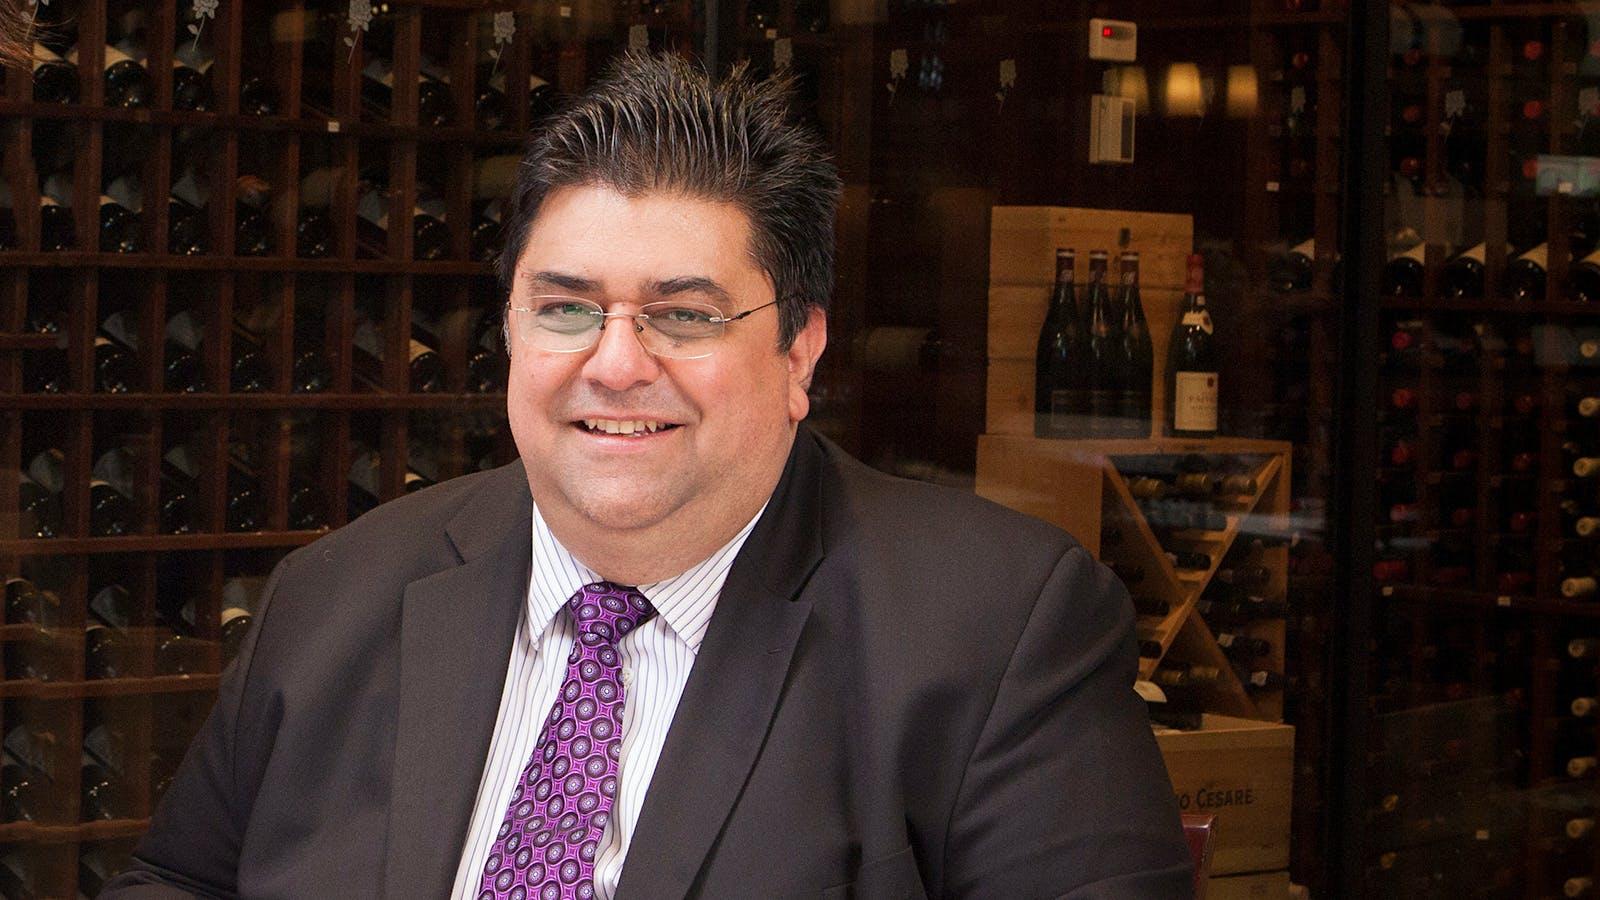 Wine Scam Targets Business Elite